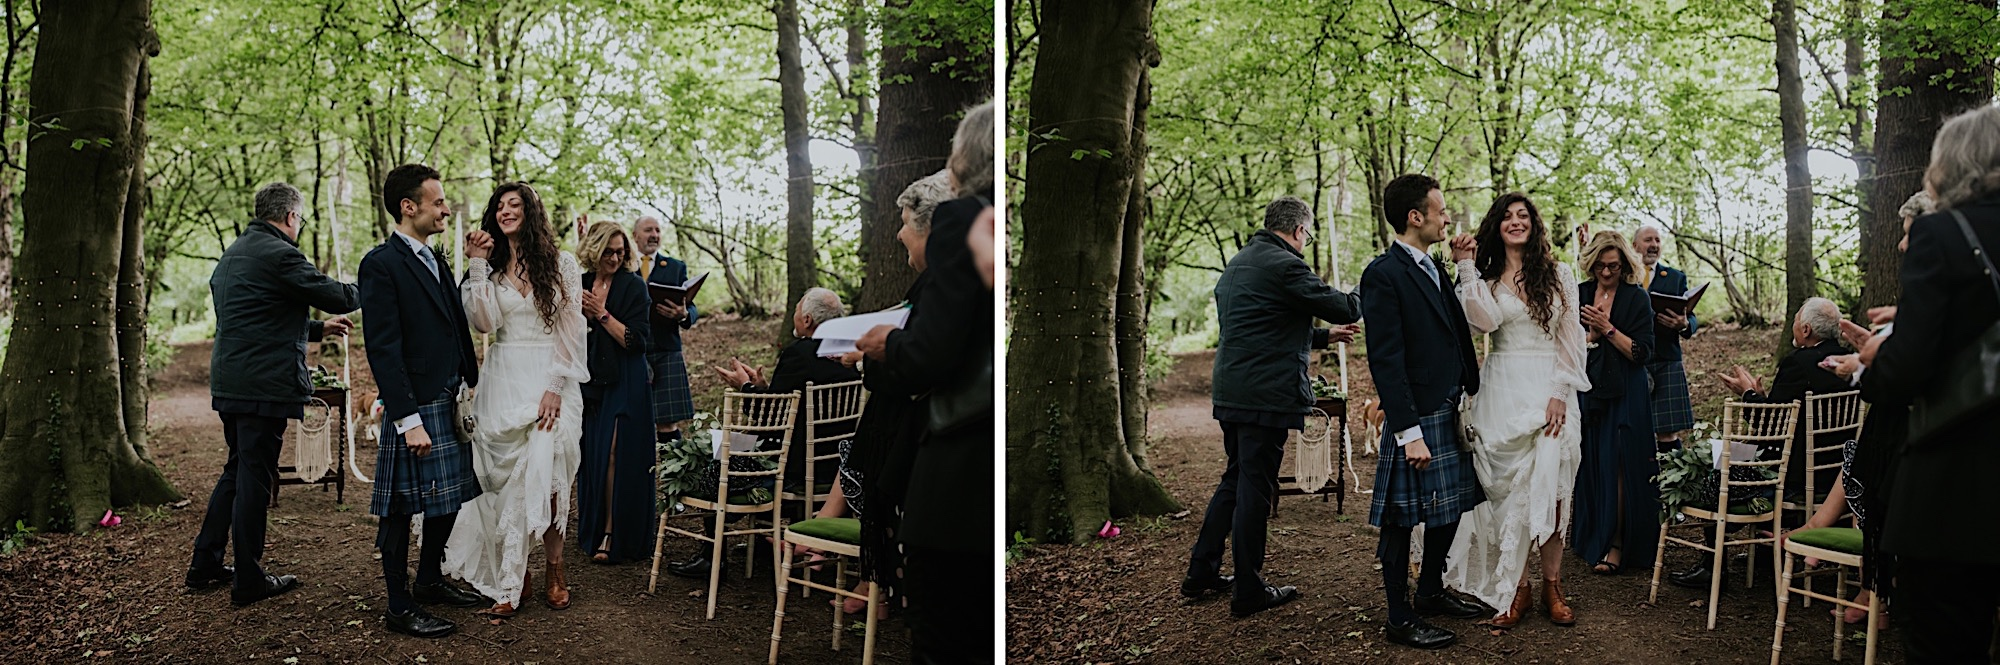 pegan broom jump wedding ceremony, couple jumping over a broom